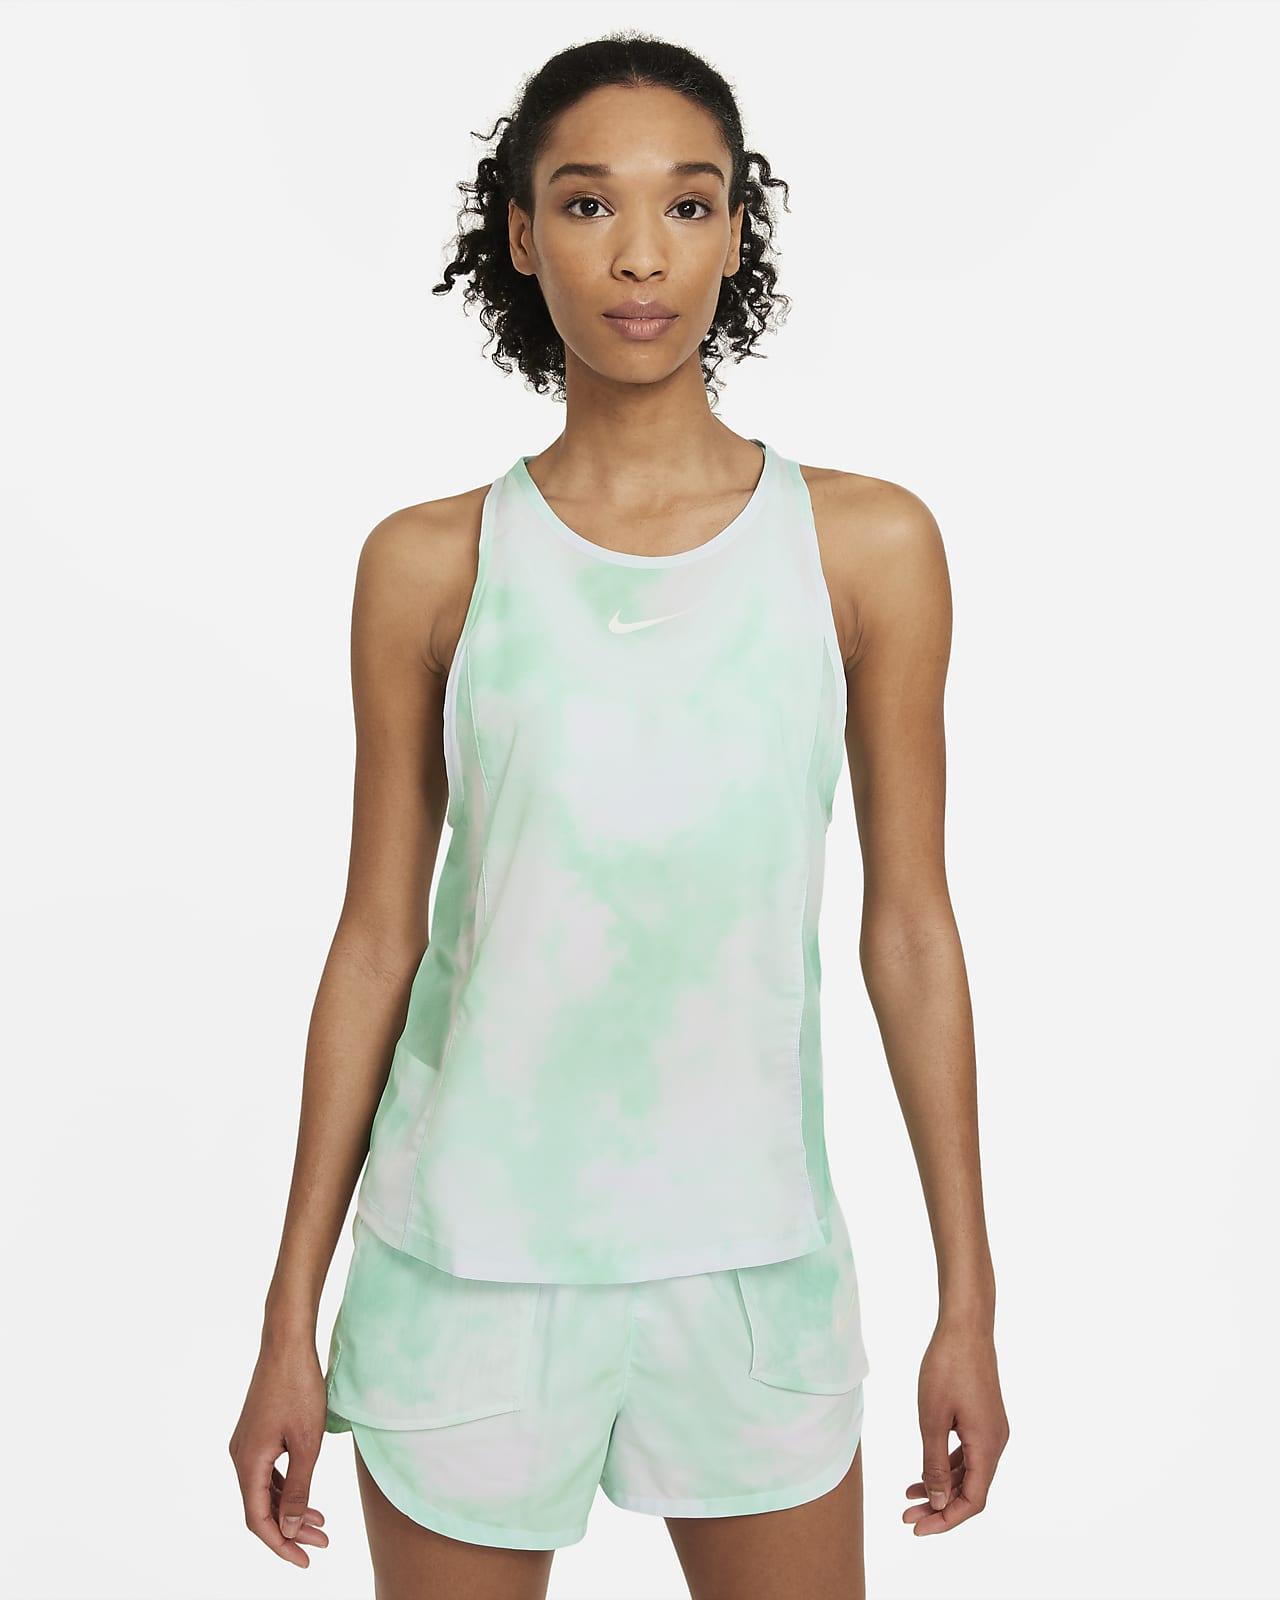 Camisola de running sem mangas Nike Icon Clash City Sleek para mulher